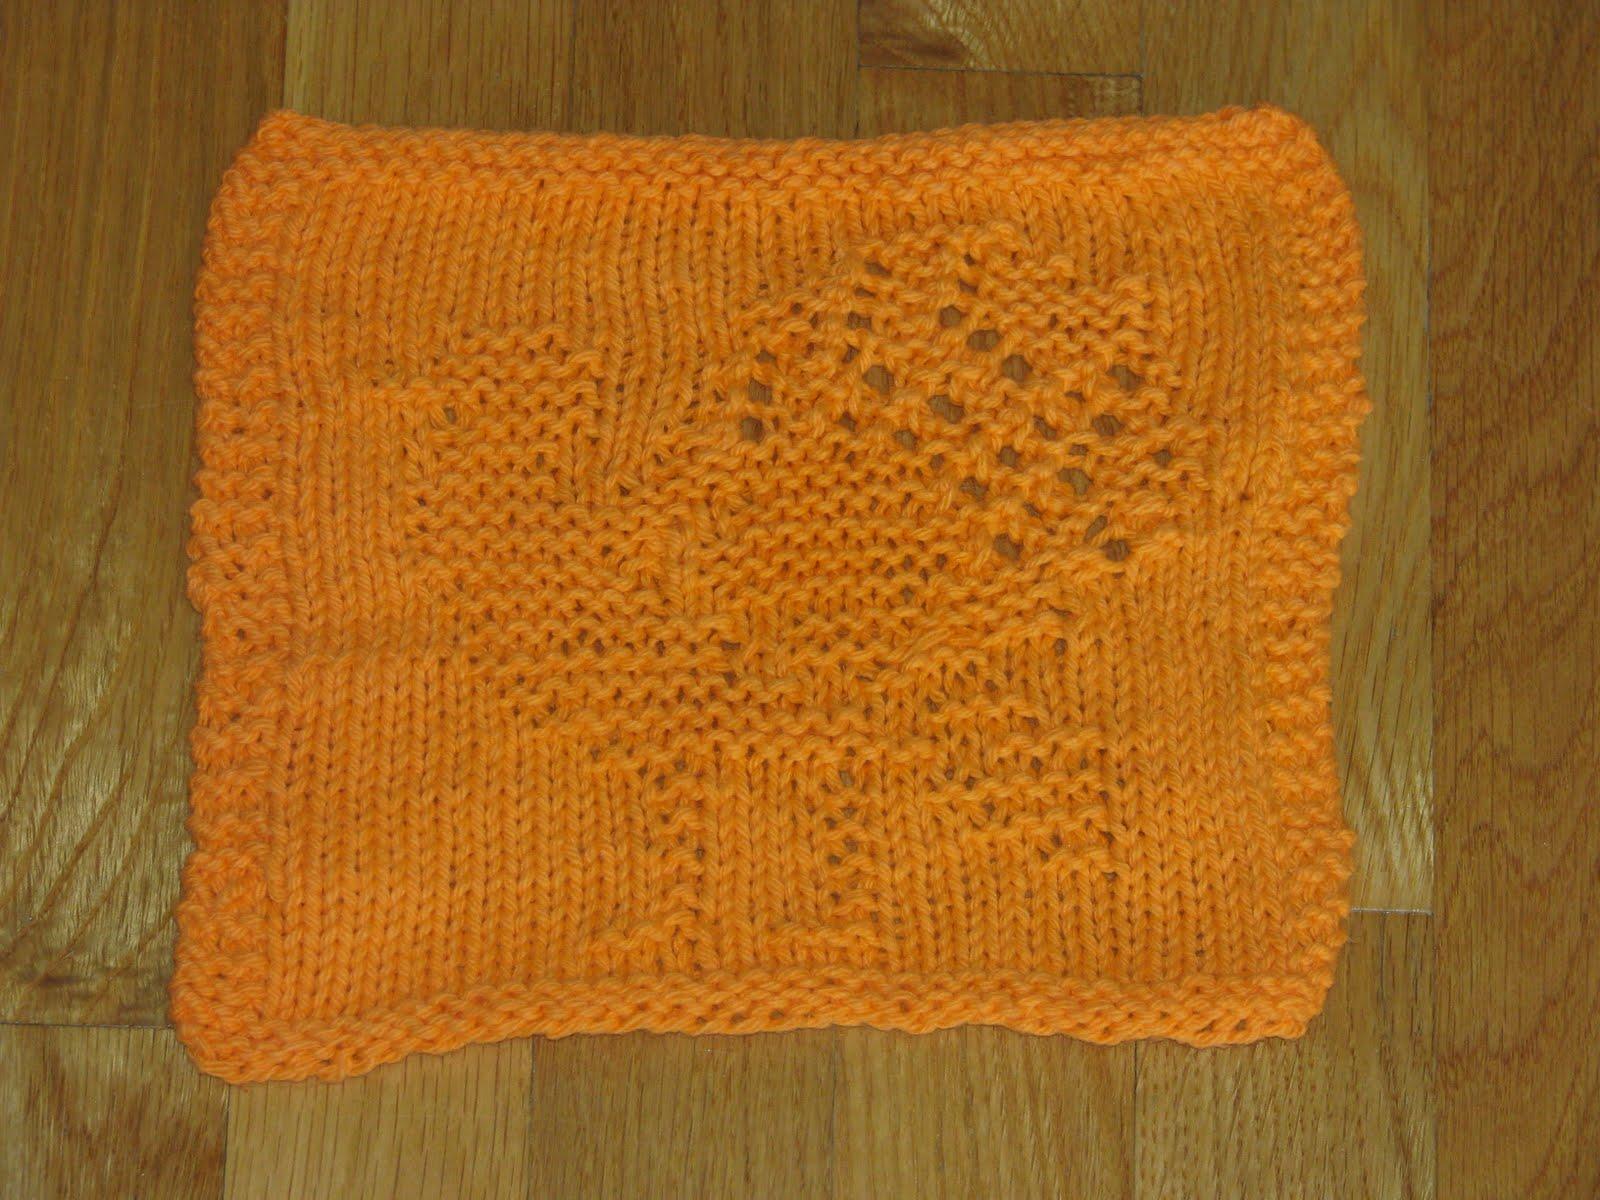 Craft Attic Resources: Turkey Knitted Dishcloth